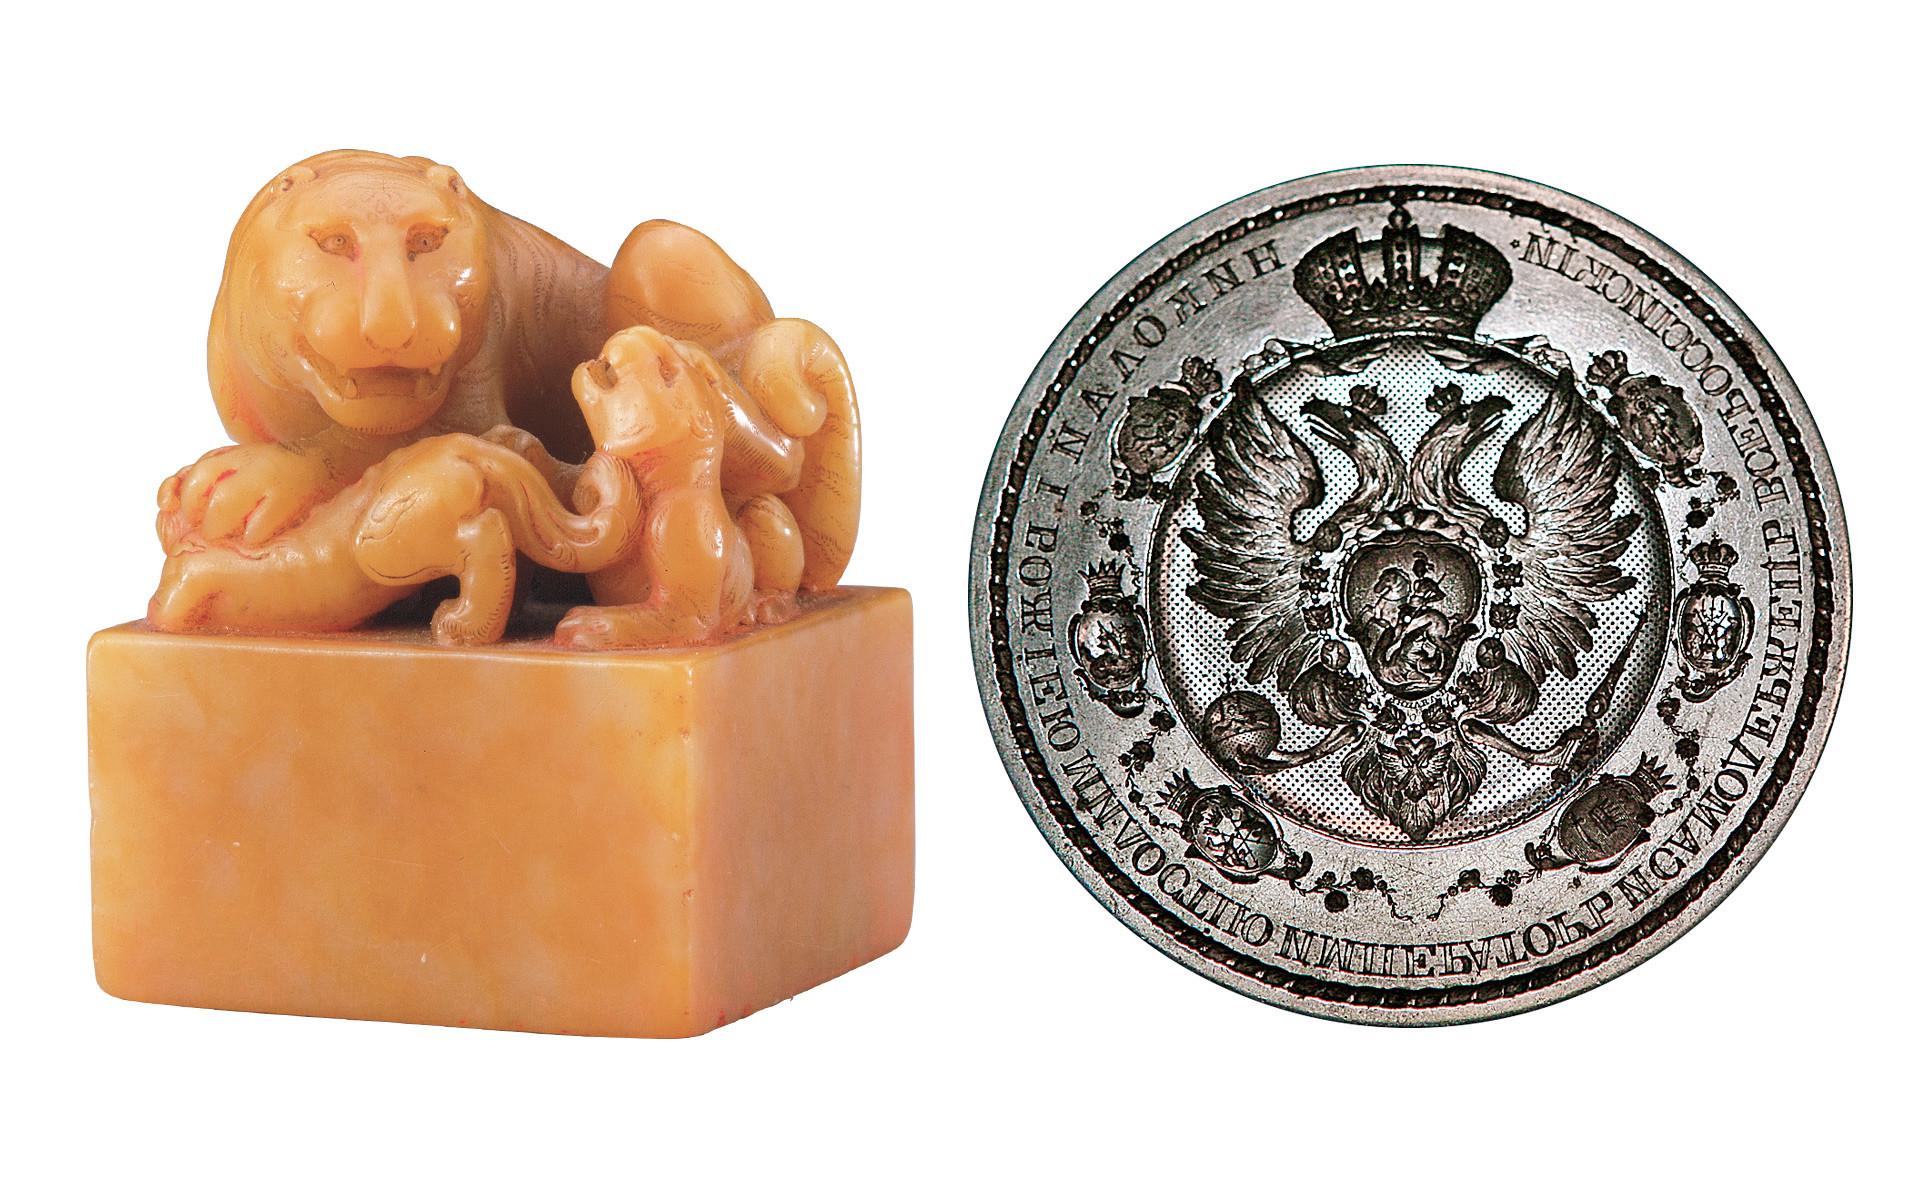 Lijevo: Carski pečat. Dinastija Qing, vladavina Qianlonga (1736.–1796.) Žuti agalmatolit. Desno: Mali državni pečat cara Nikolaja I. (čelik). Izložba